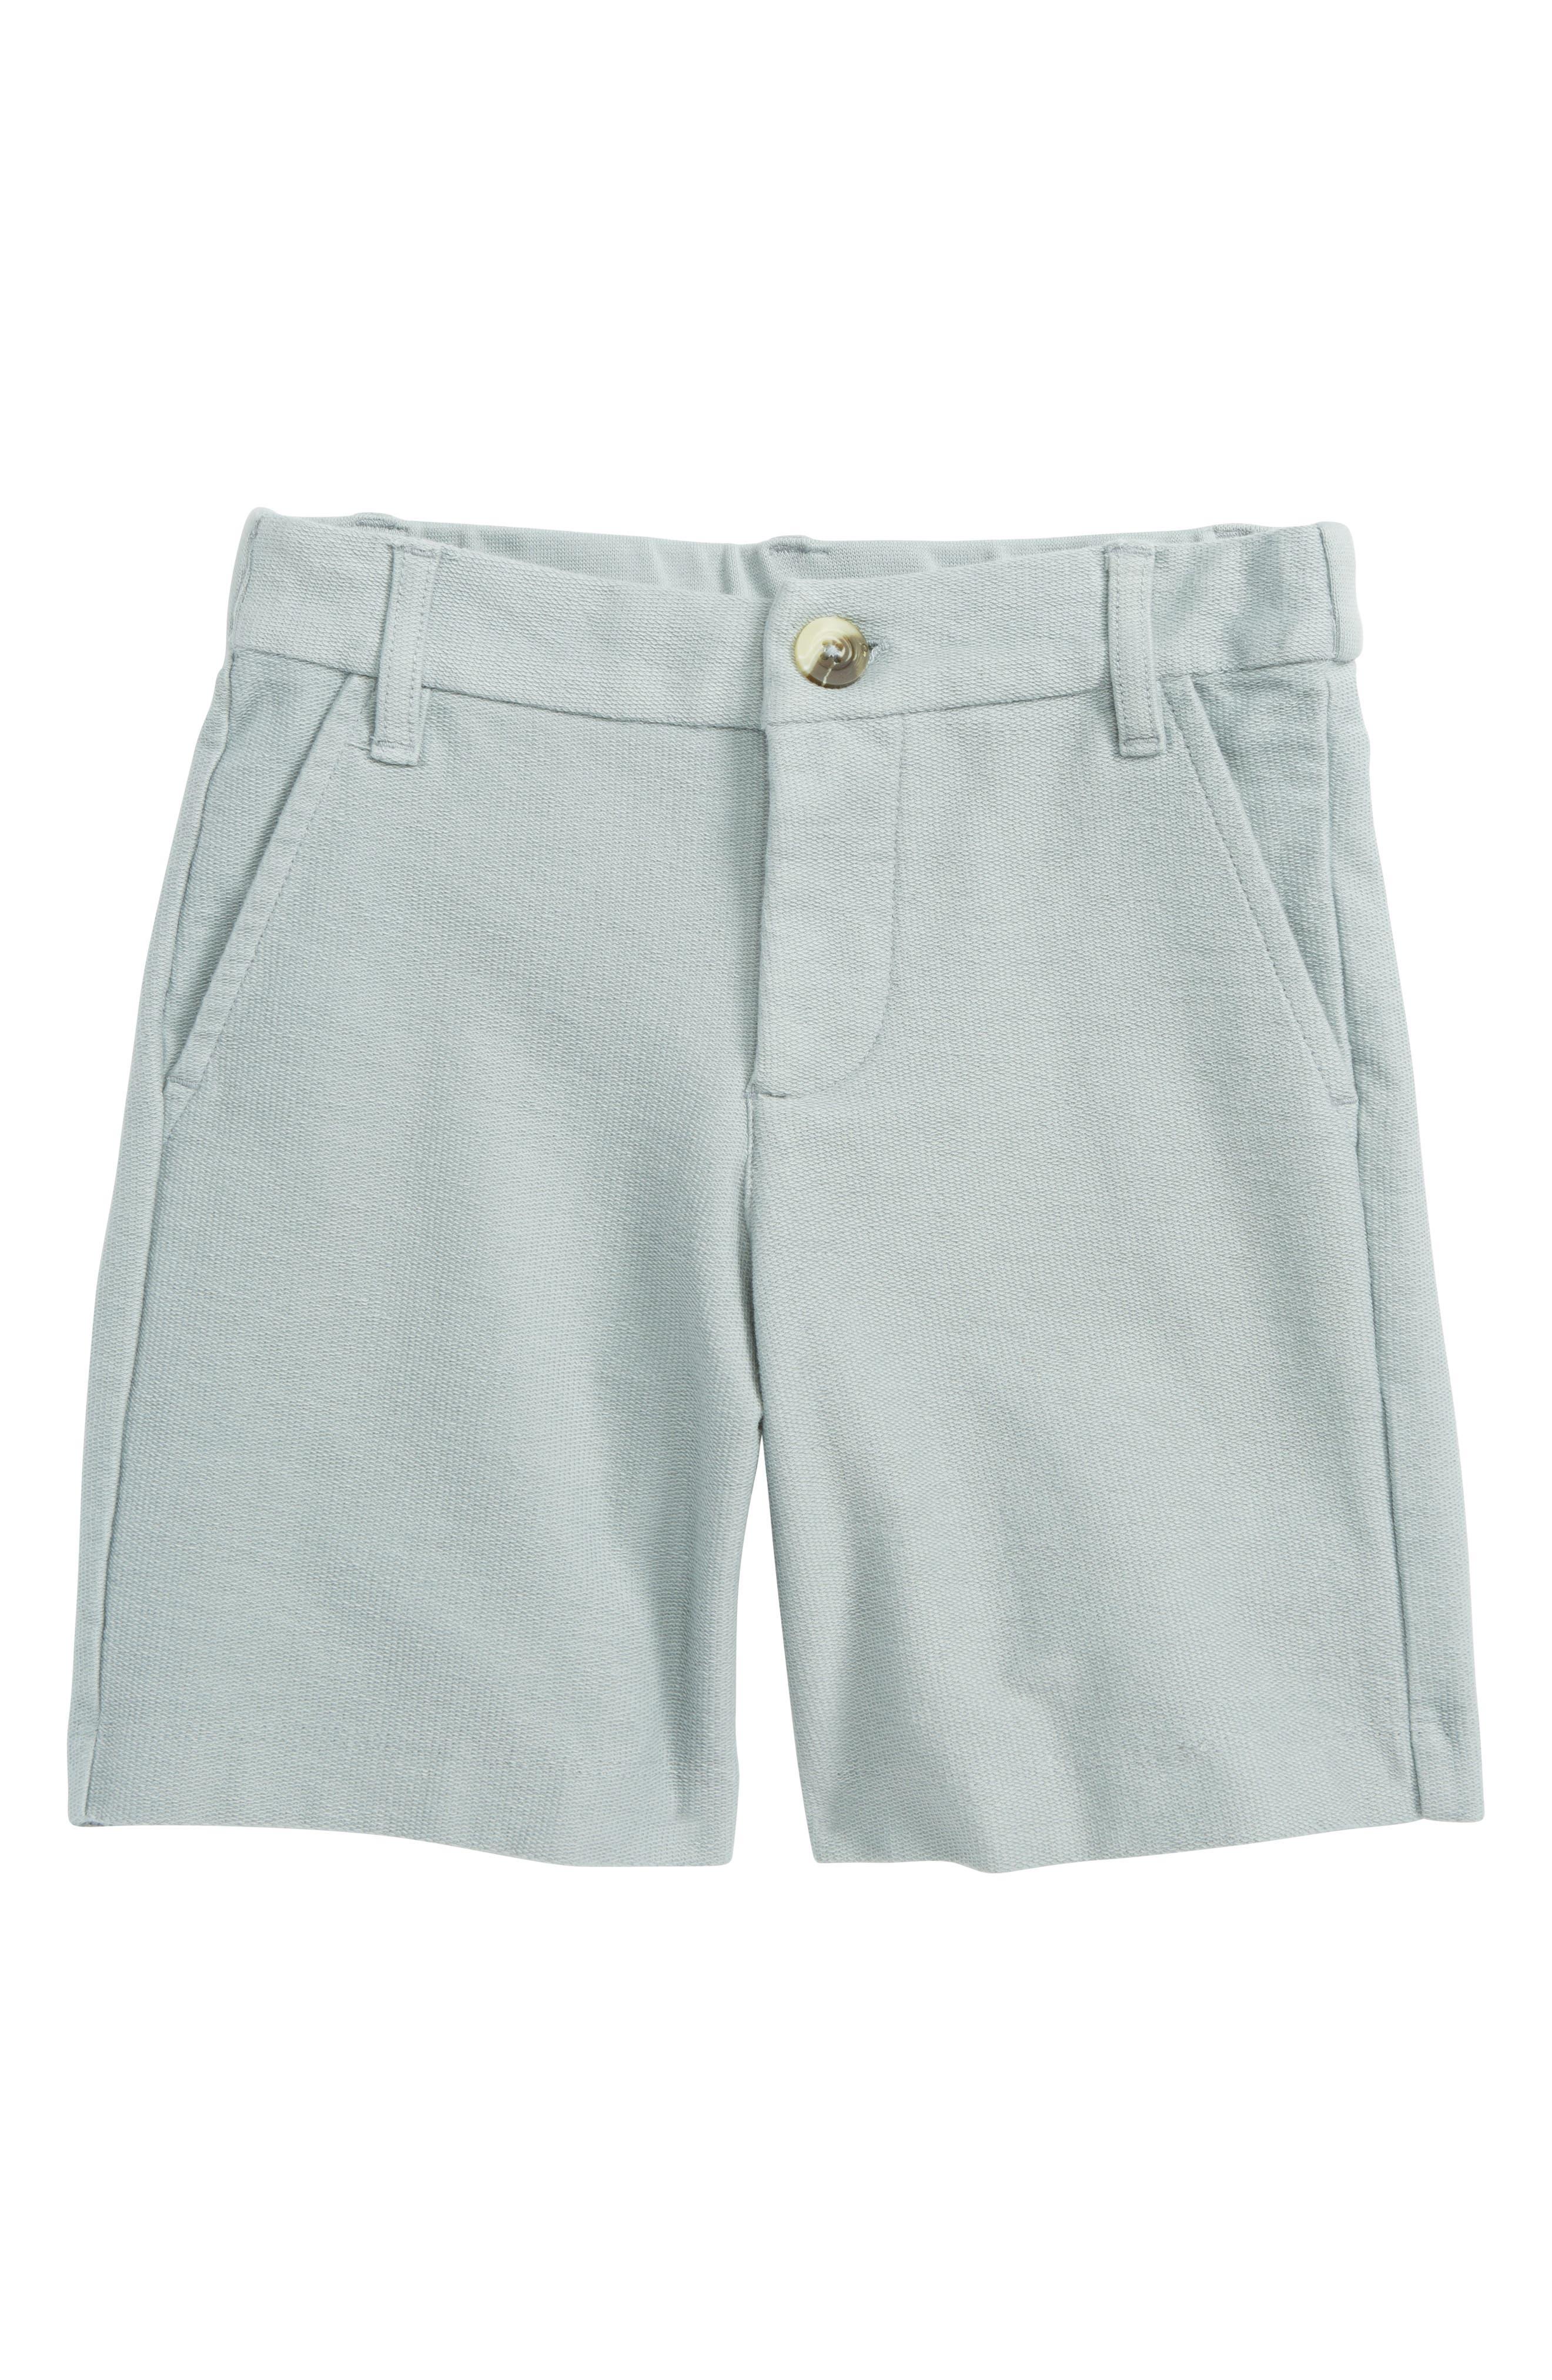 Alternate Image 1 Selected - Peek Easton Shorts (Toddler Boys, Little Boys & Big Boys)